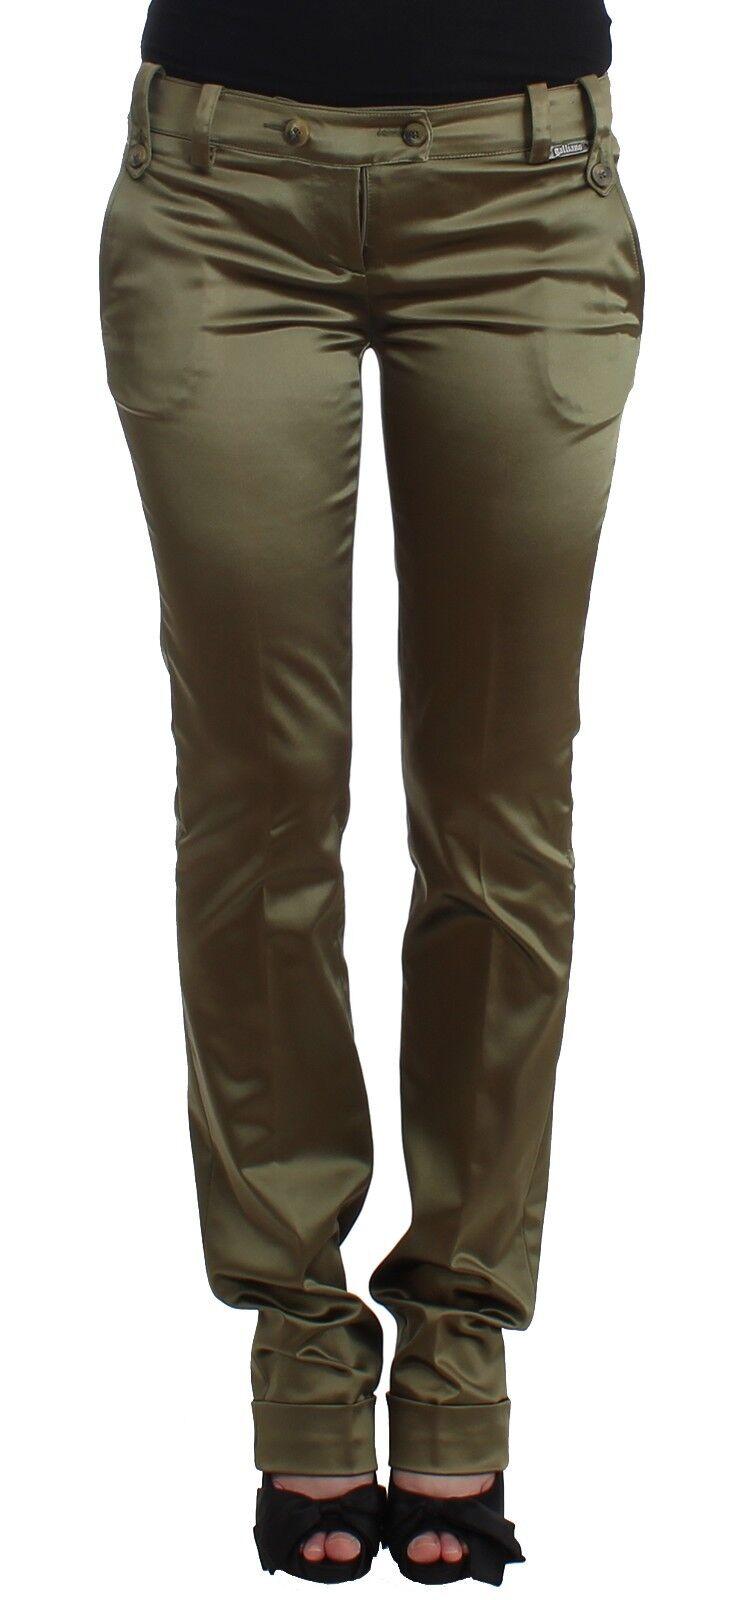 NEW  JOHN GALLIANO Pants Green Straight Leg Dress Slim Skinny Nylon IT40 US6